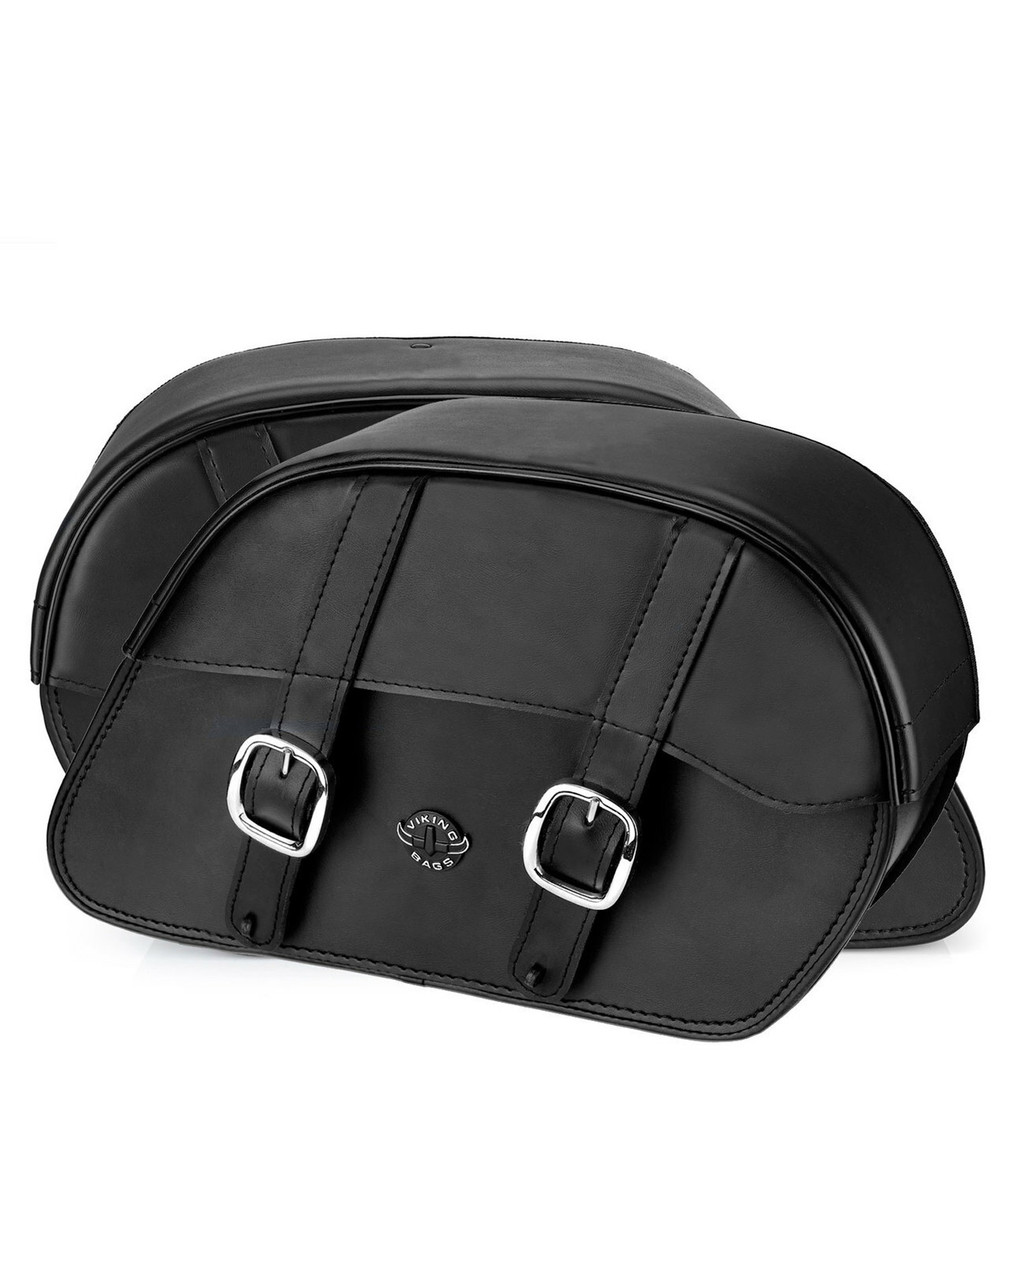 Viking Slanted Medium Motorcycle Saddlebags For Harley Softail Low Rider Both Bags